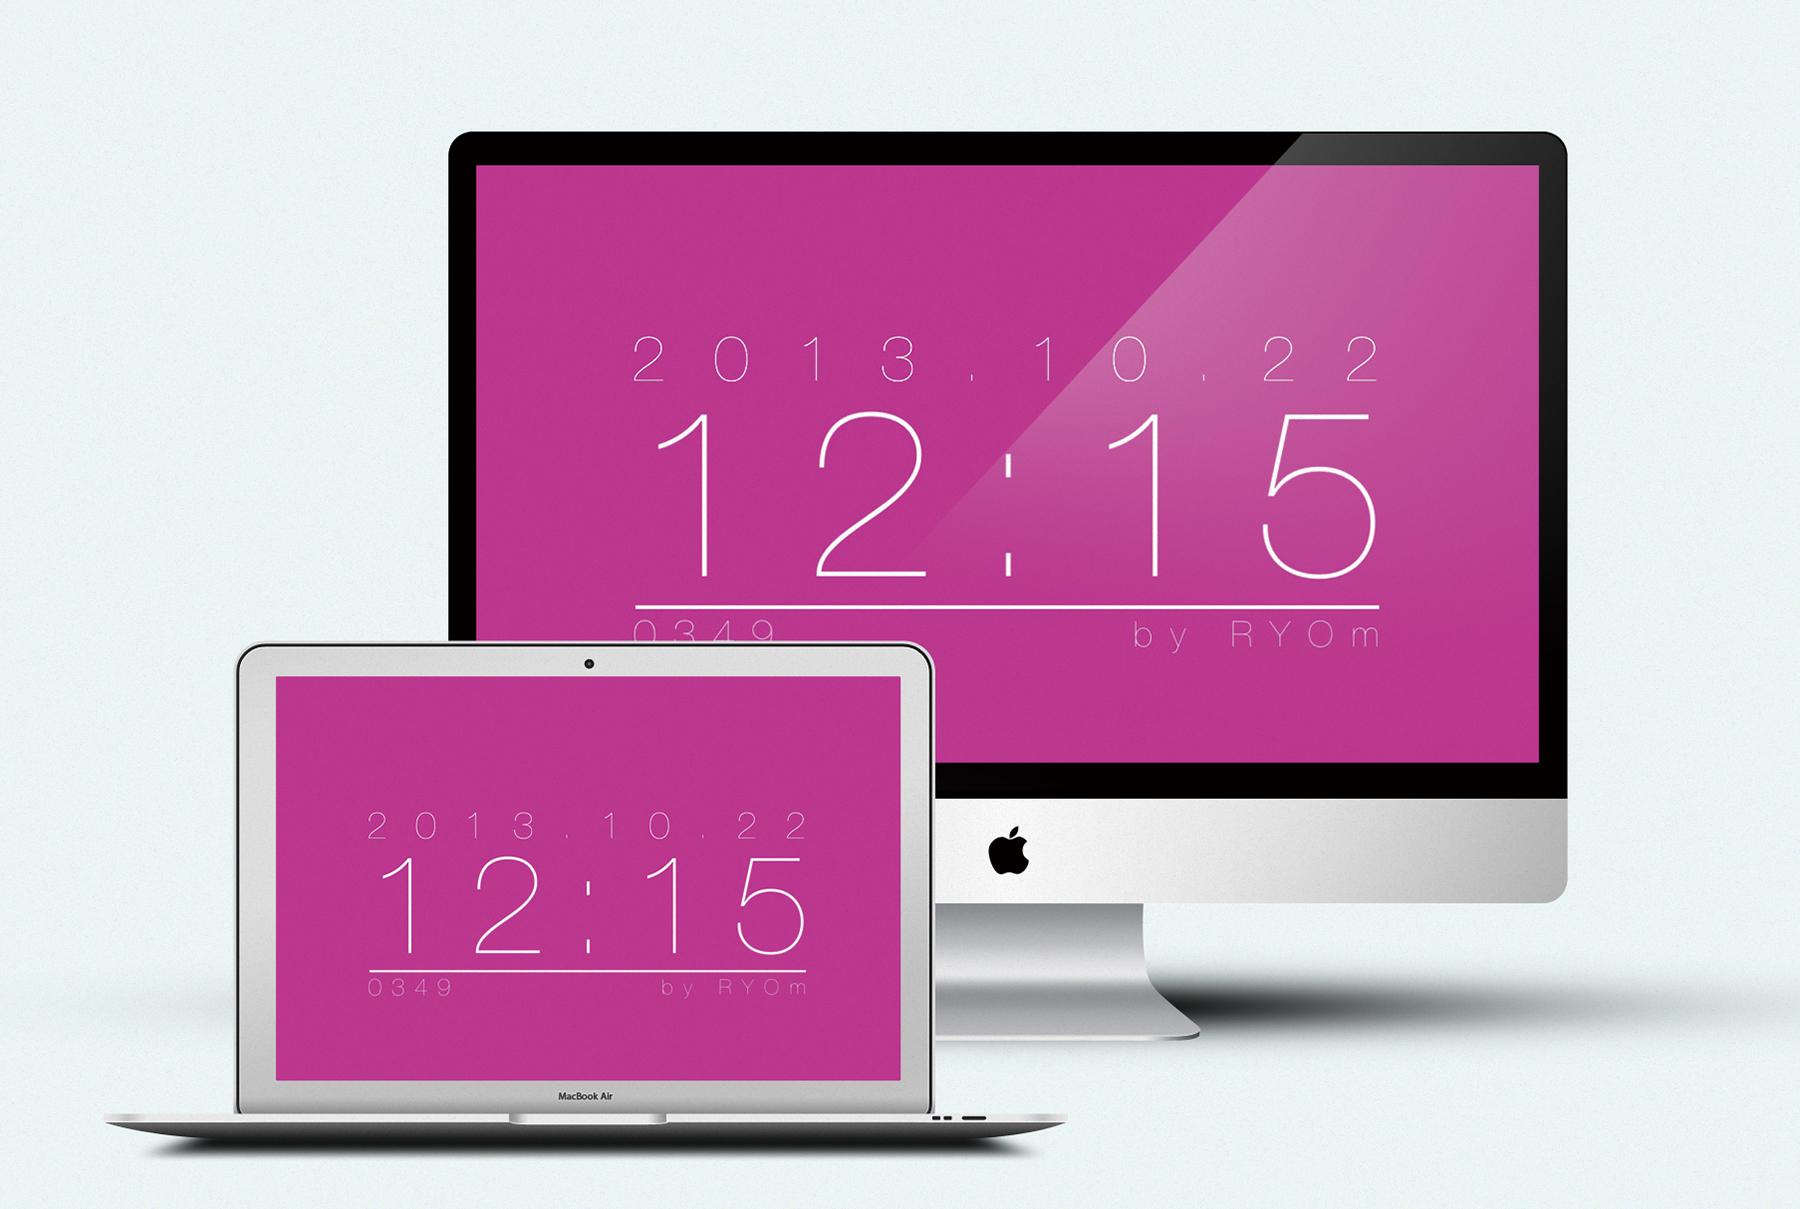 Simple Clock Screen saver for Mavericks